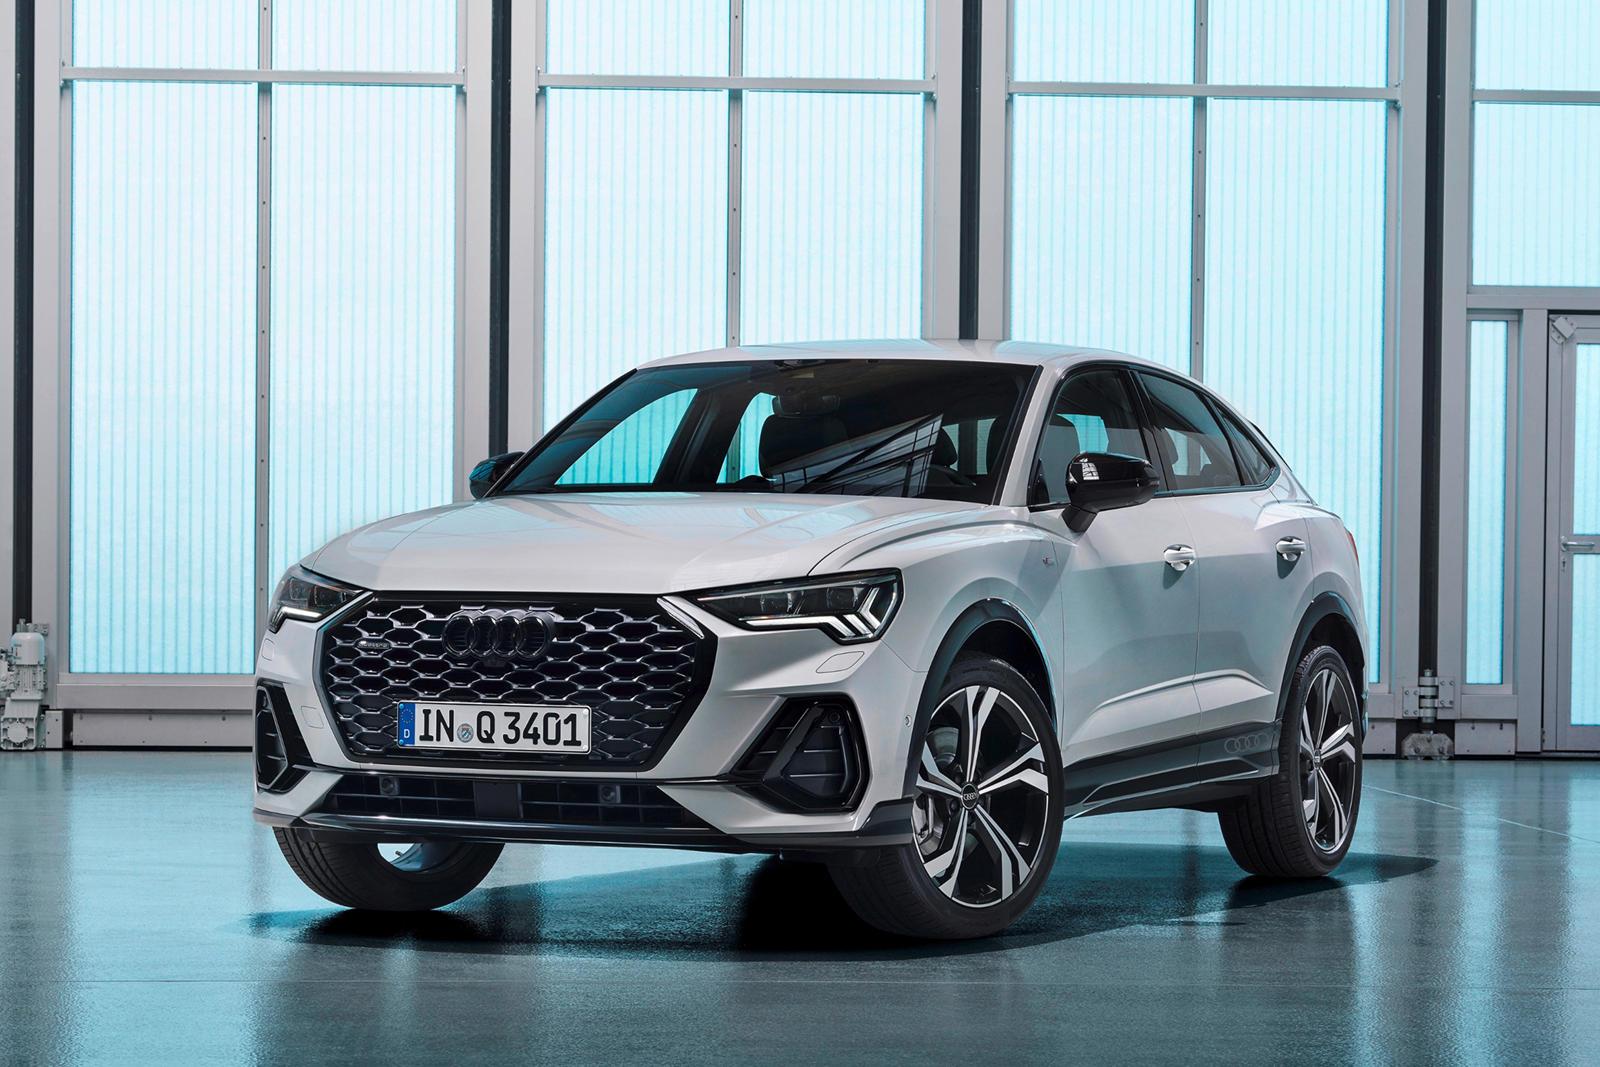 2020 Audi Q3 Usa Interior